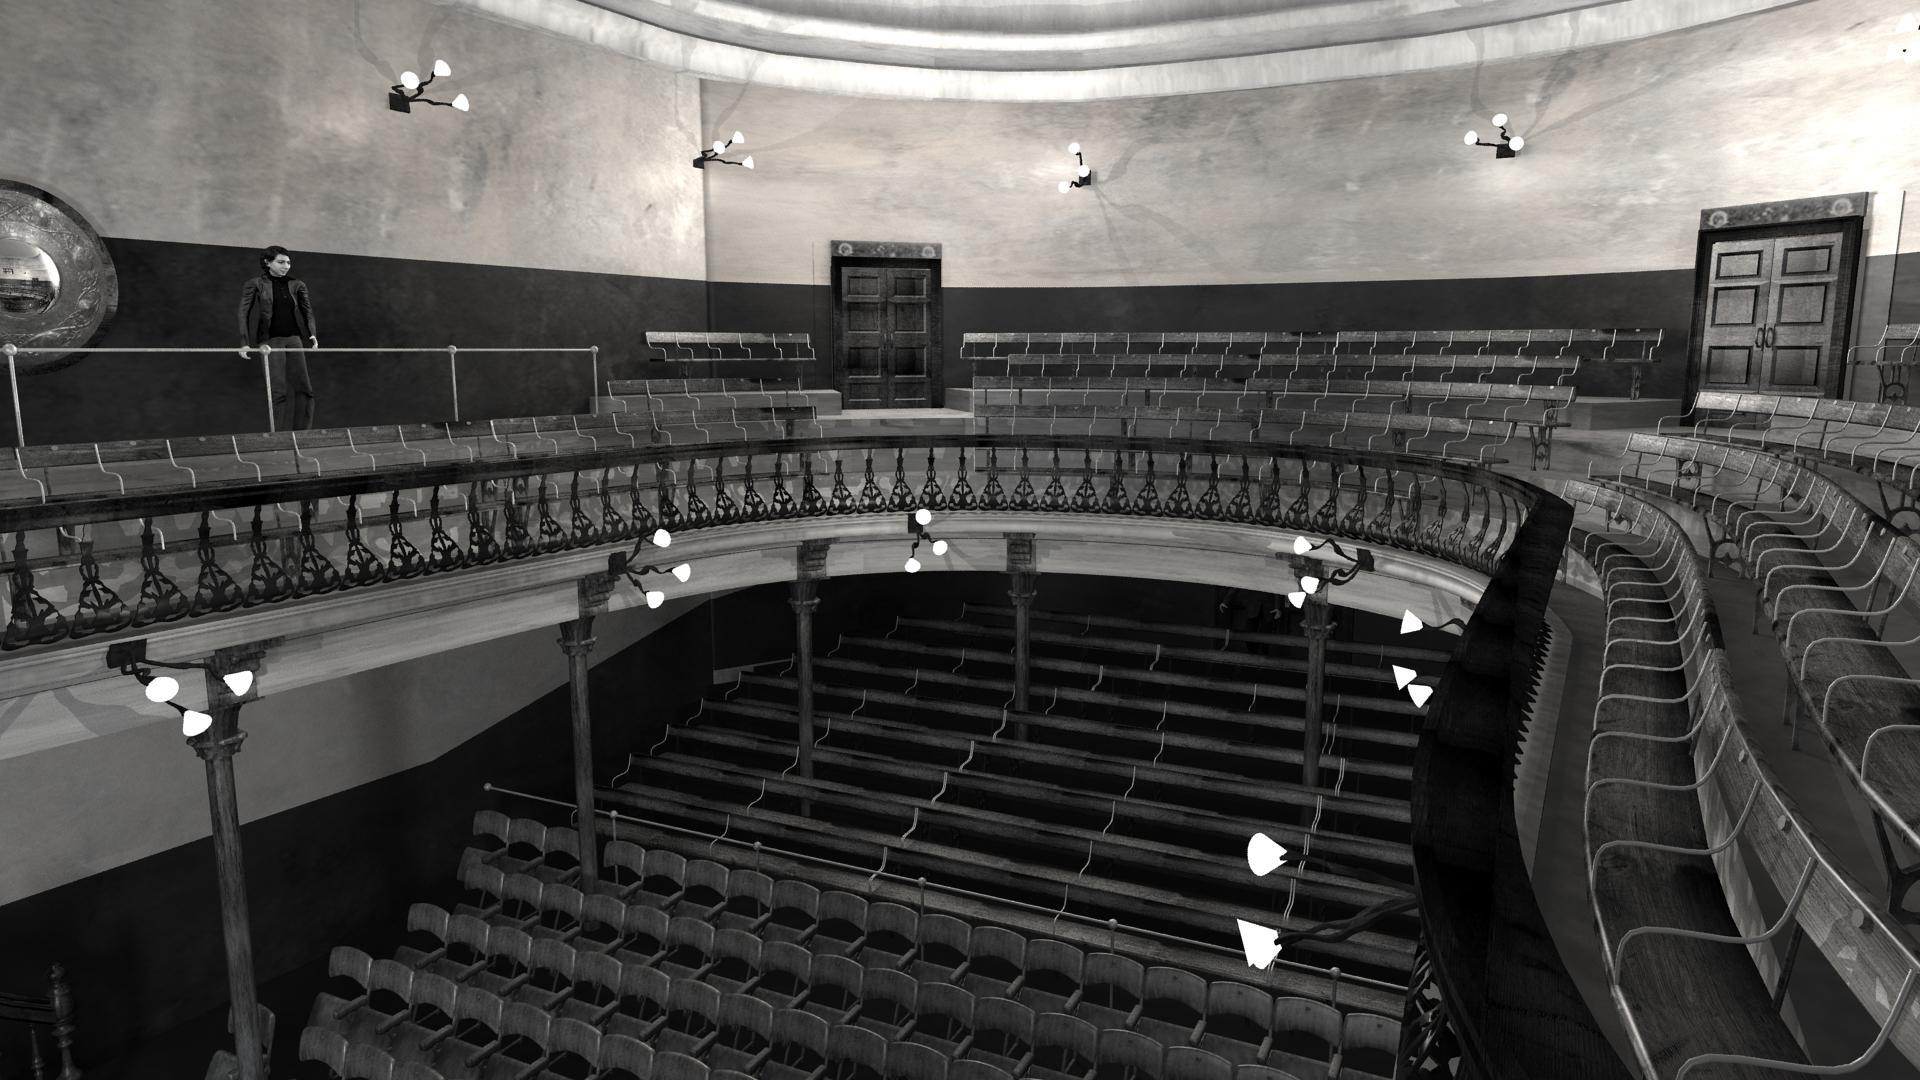 View towards Balcony of Abbey Theatre, 1904. Digital model by Hugh Denard (research) and Niall Ó hOisín/Noho (modelling), 2011.